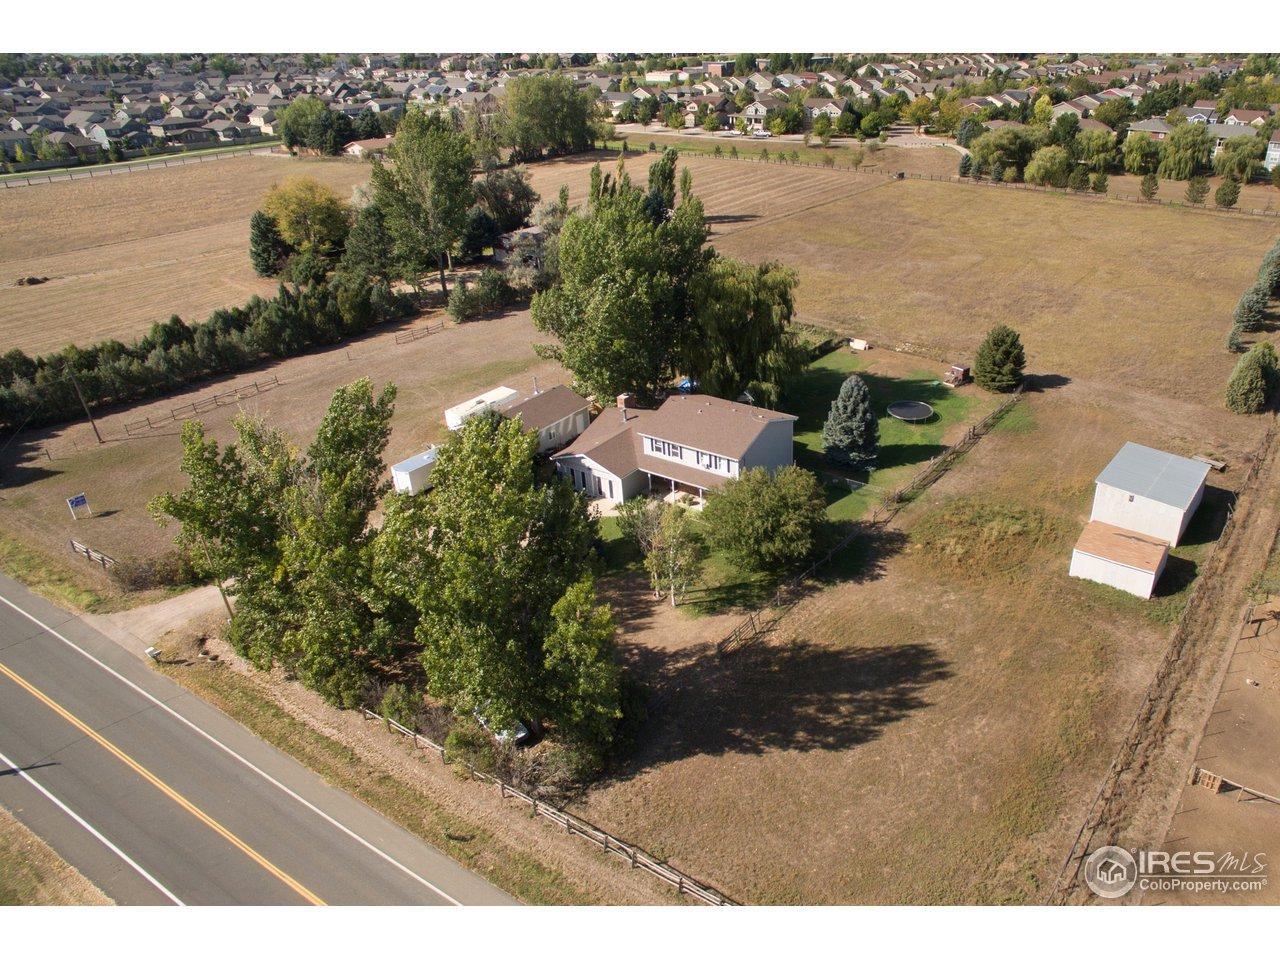 Fort Collins Real Estate for sale 800000 - 1000000